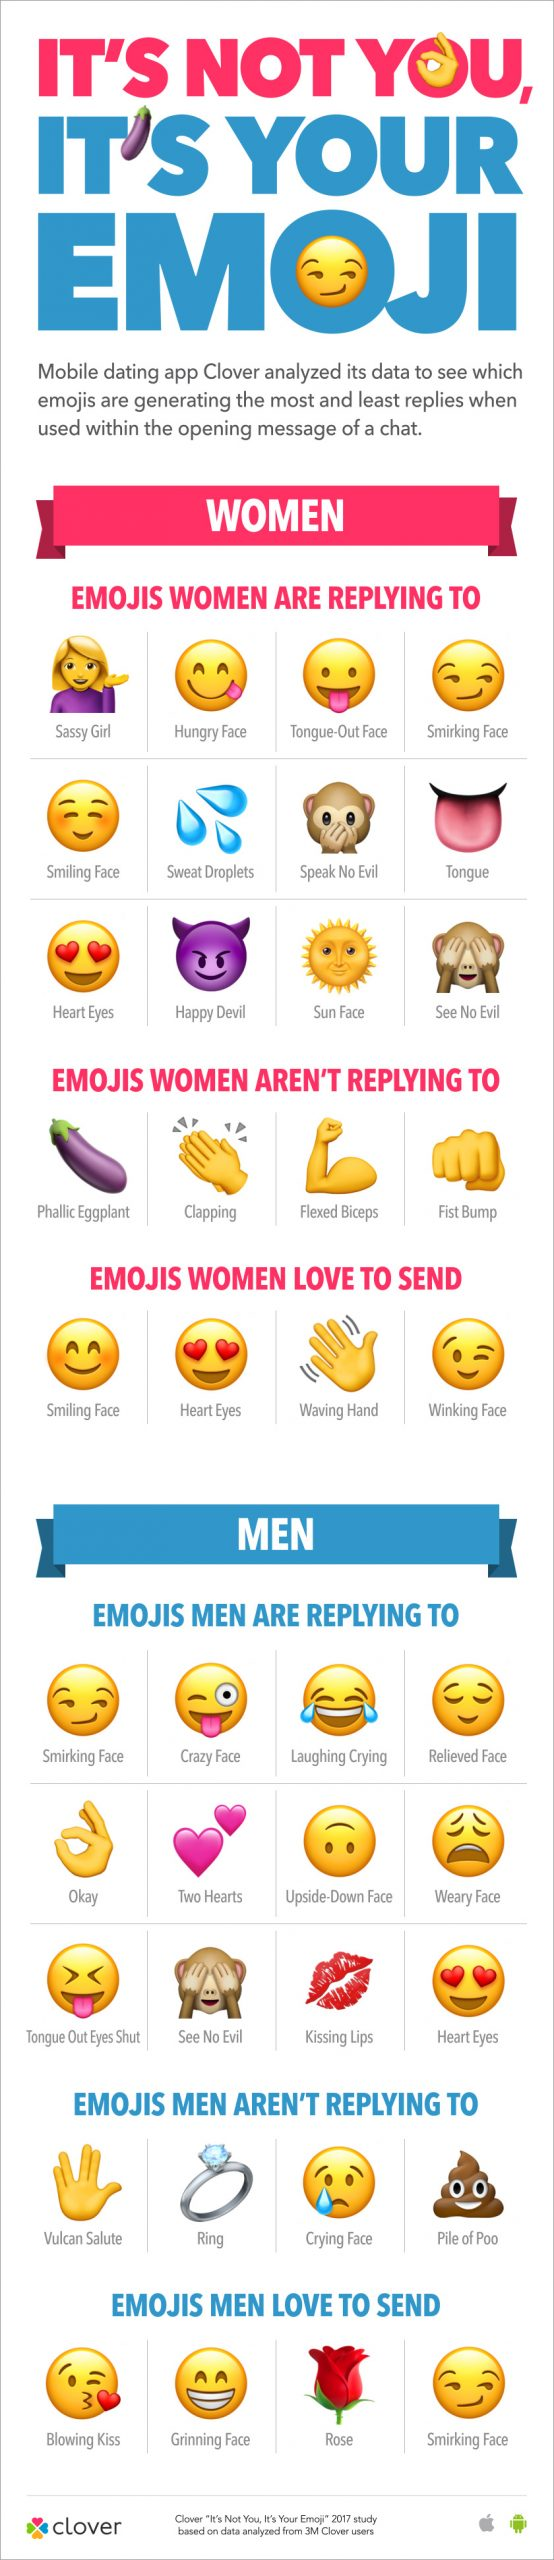 clover-infographic-emojistudy-2017